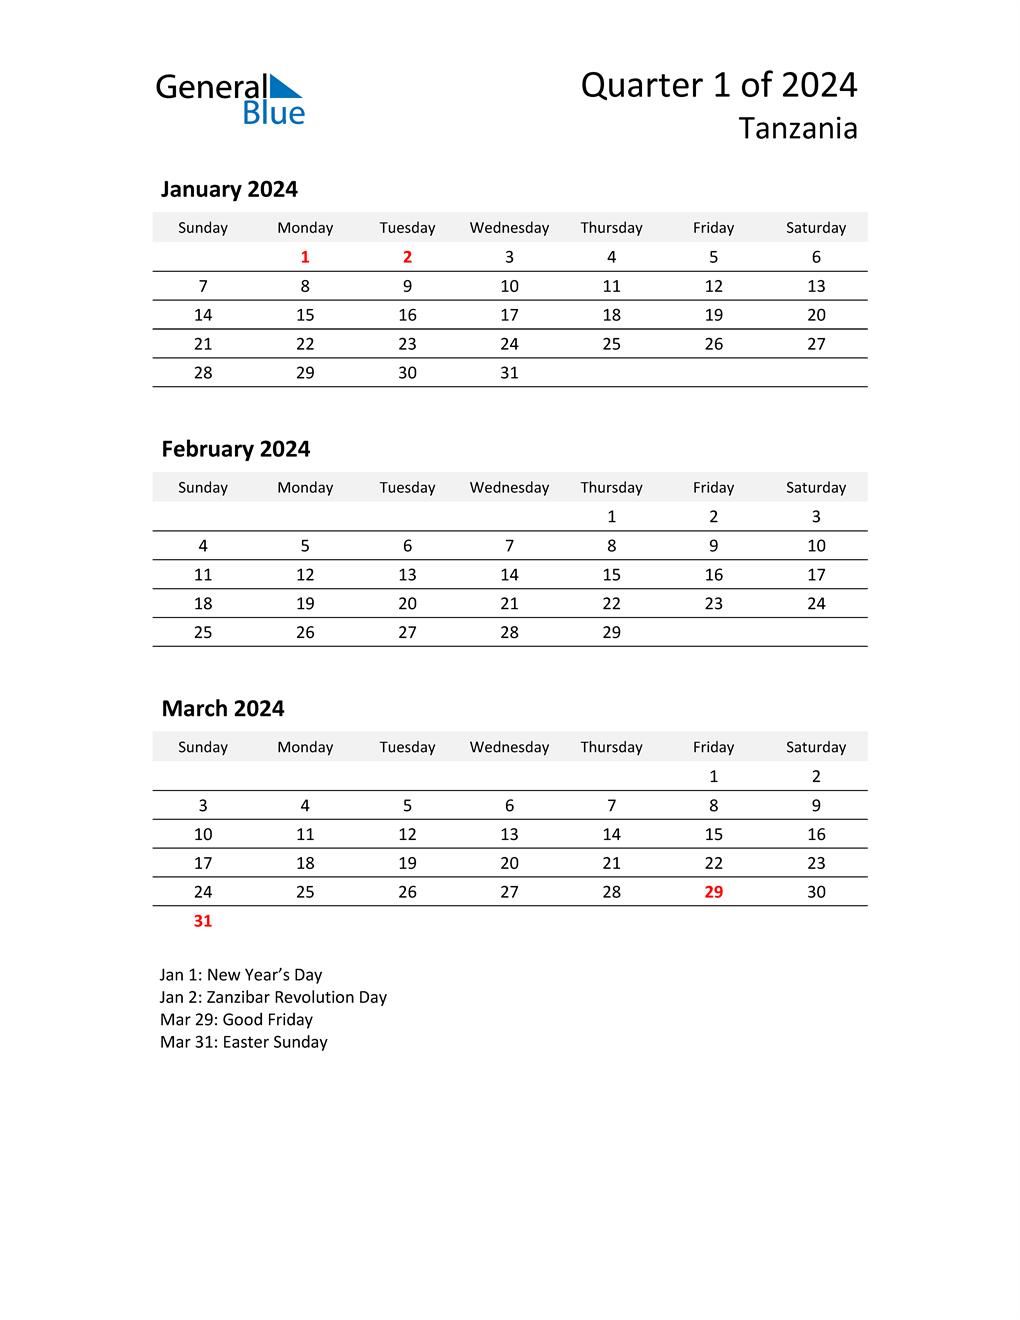 2024 Three-Month Calendar for Tanzania